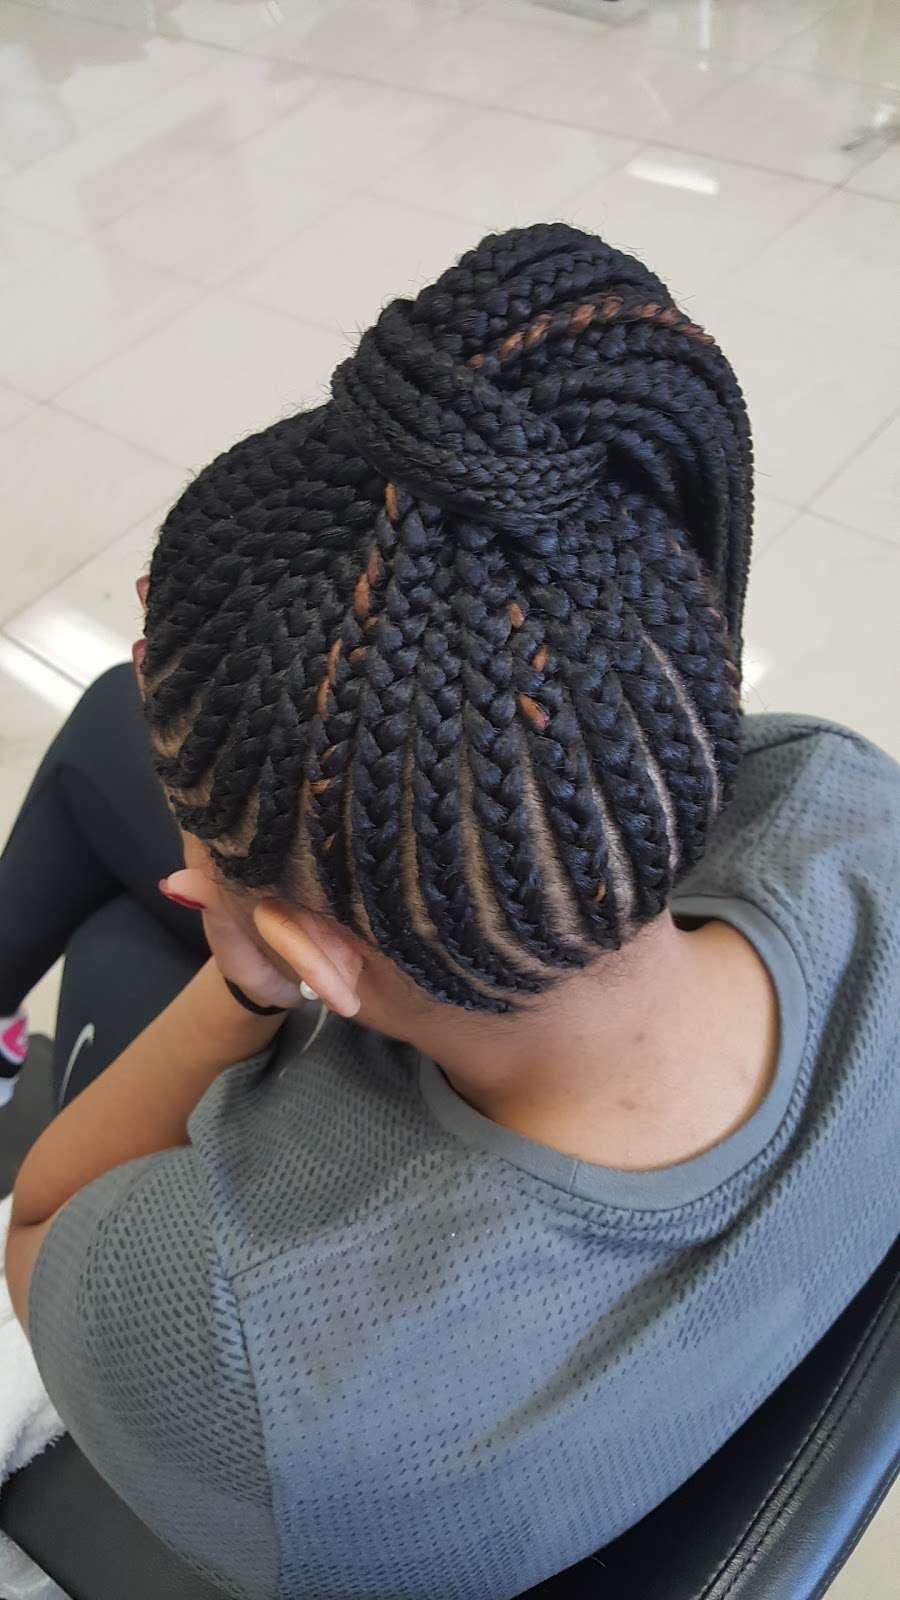 African Braids Center - hair care  | Photo 9 of 10 | Address: 309 W Kiest Blvd b, Dallas, TX 75224, USA | Phone: (855) 425-2977